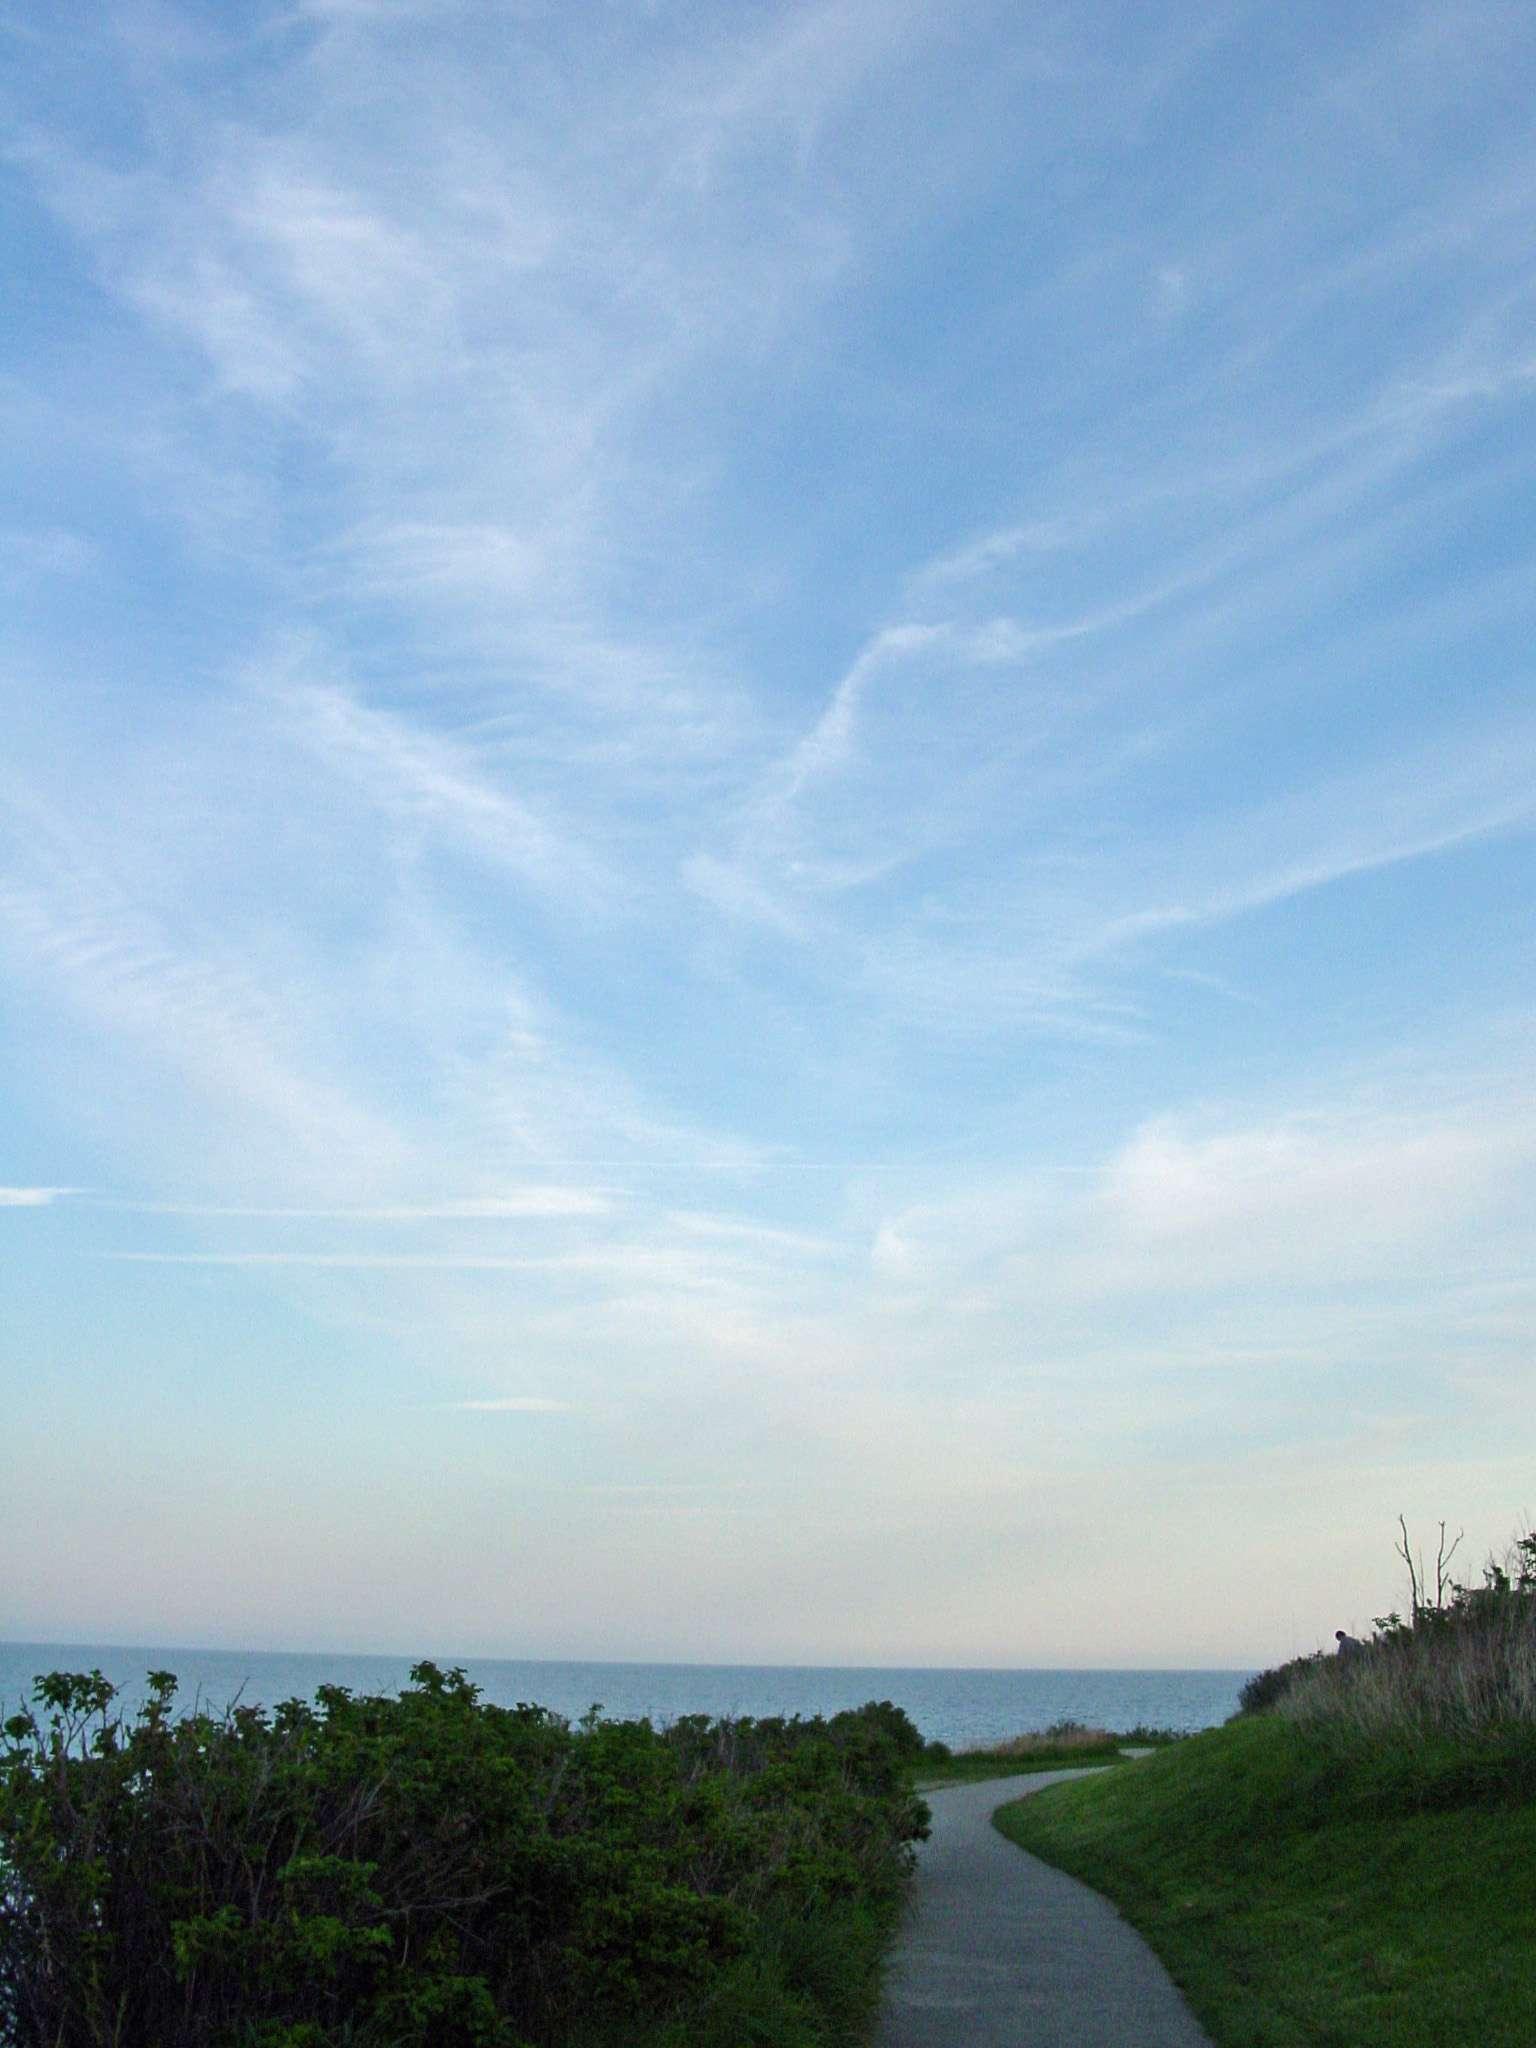 Newport Cliff Walk Photo Tour - Sunset Sky